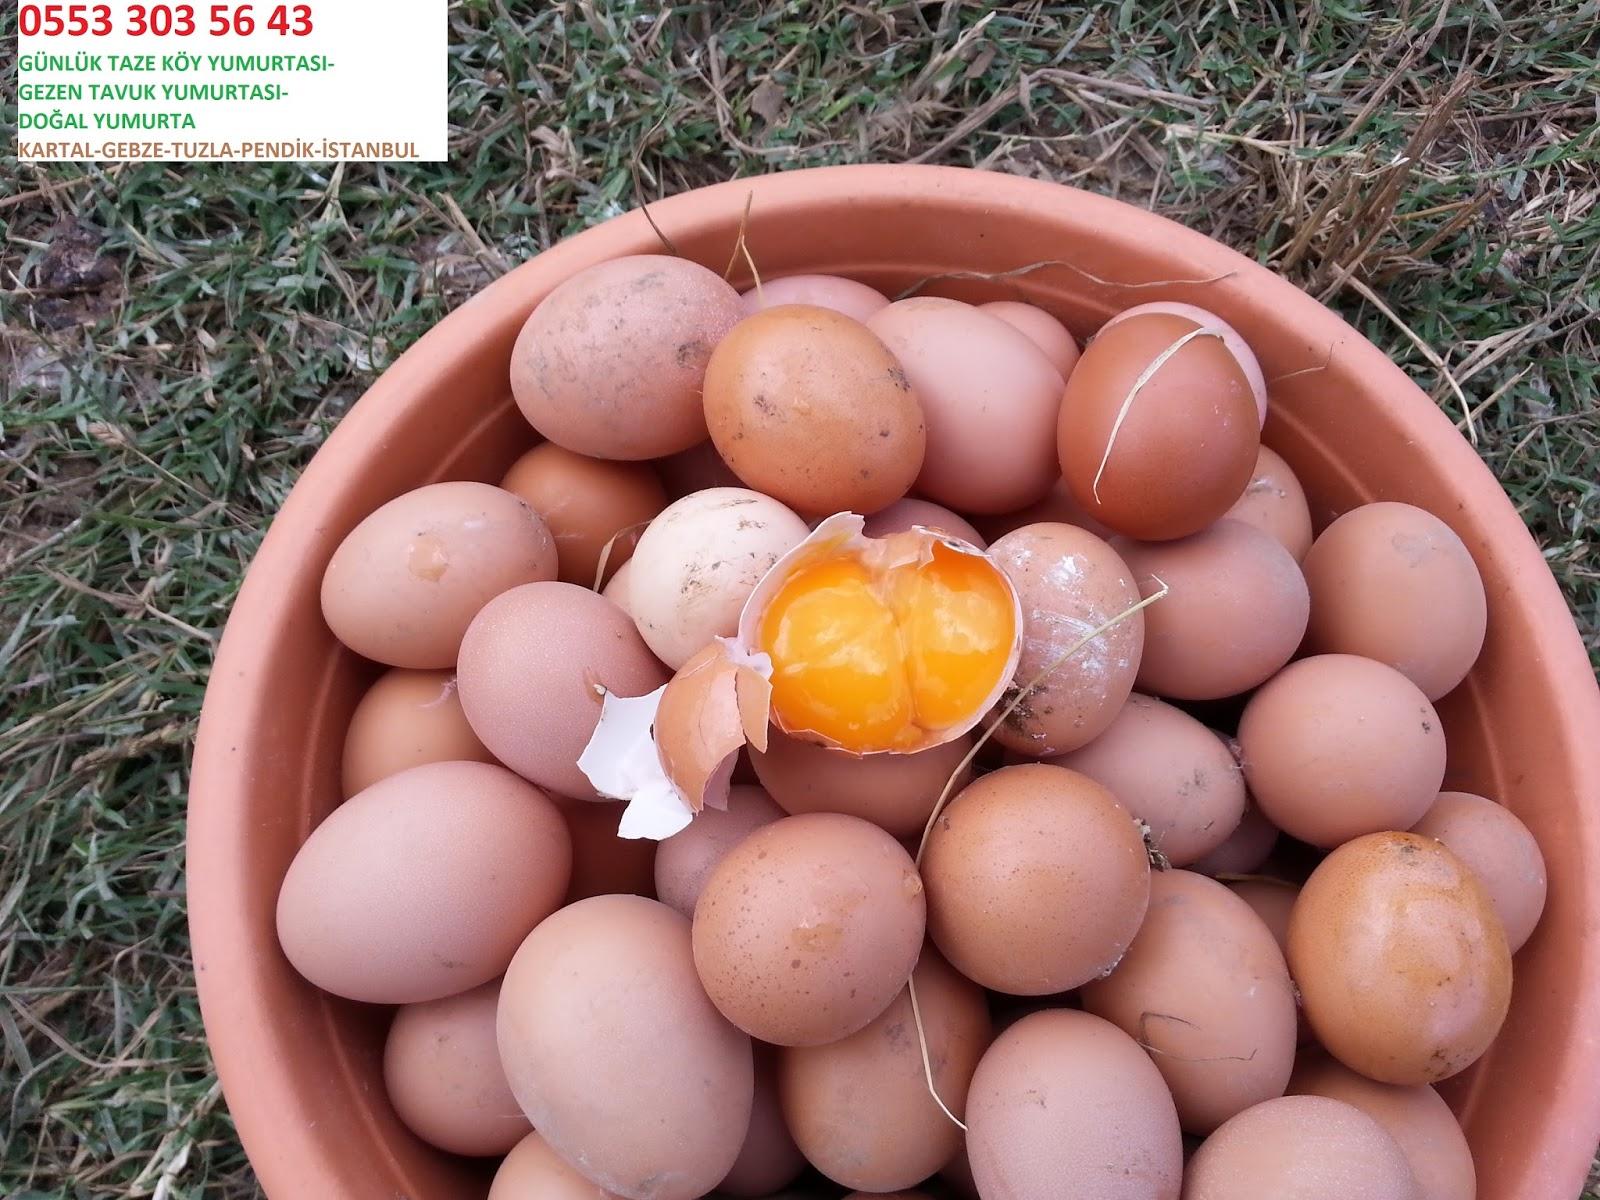 Doğal Yumurta Nasıl Anlaşılır